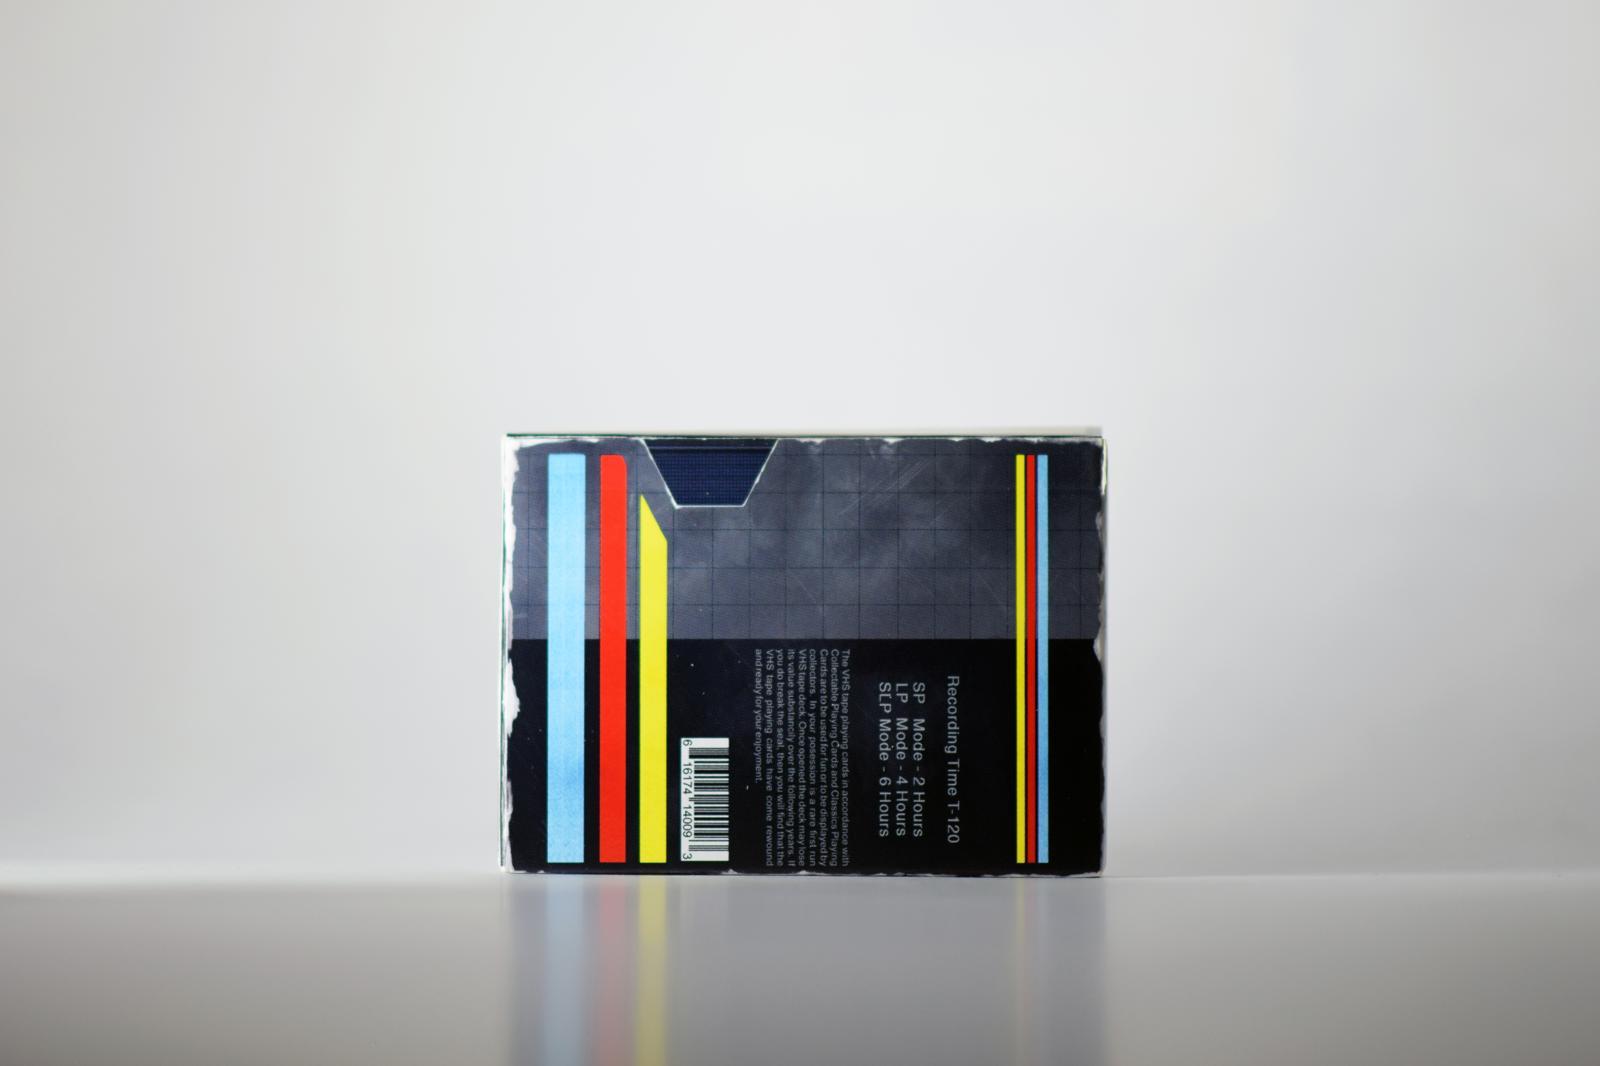 VHSBack